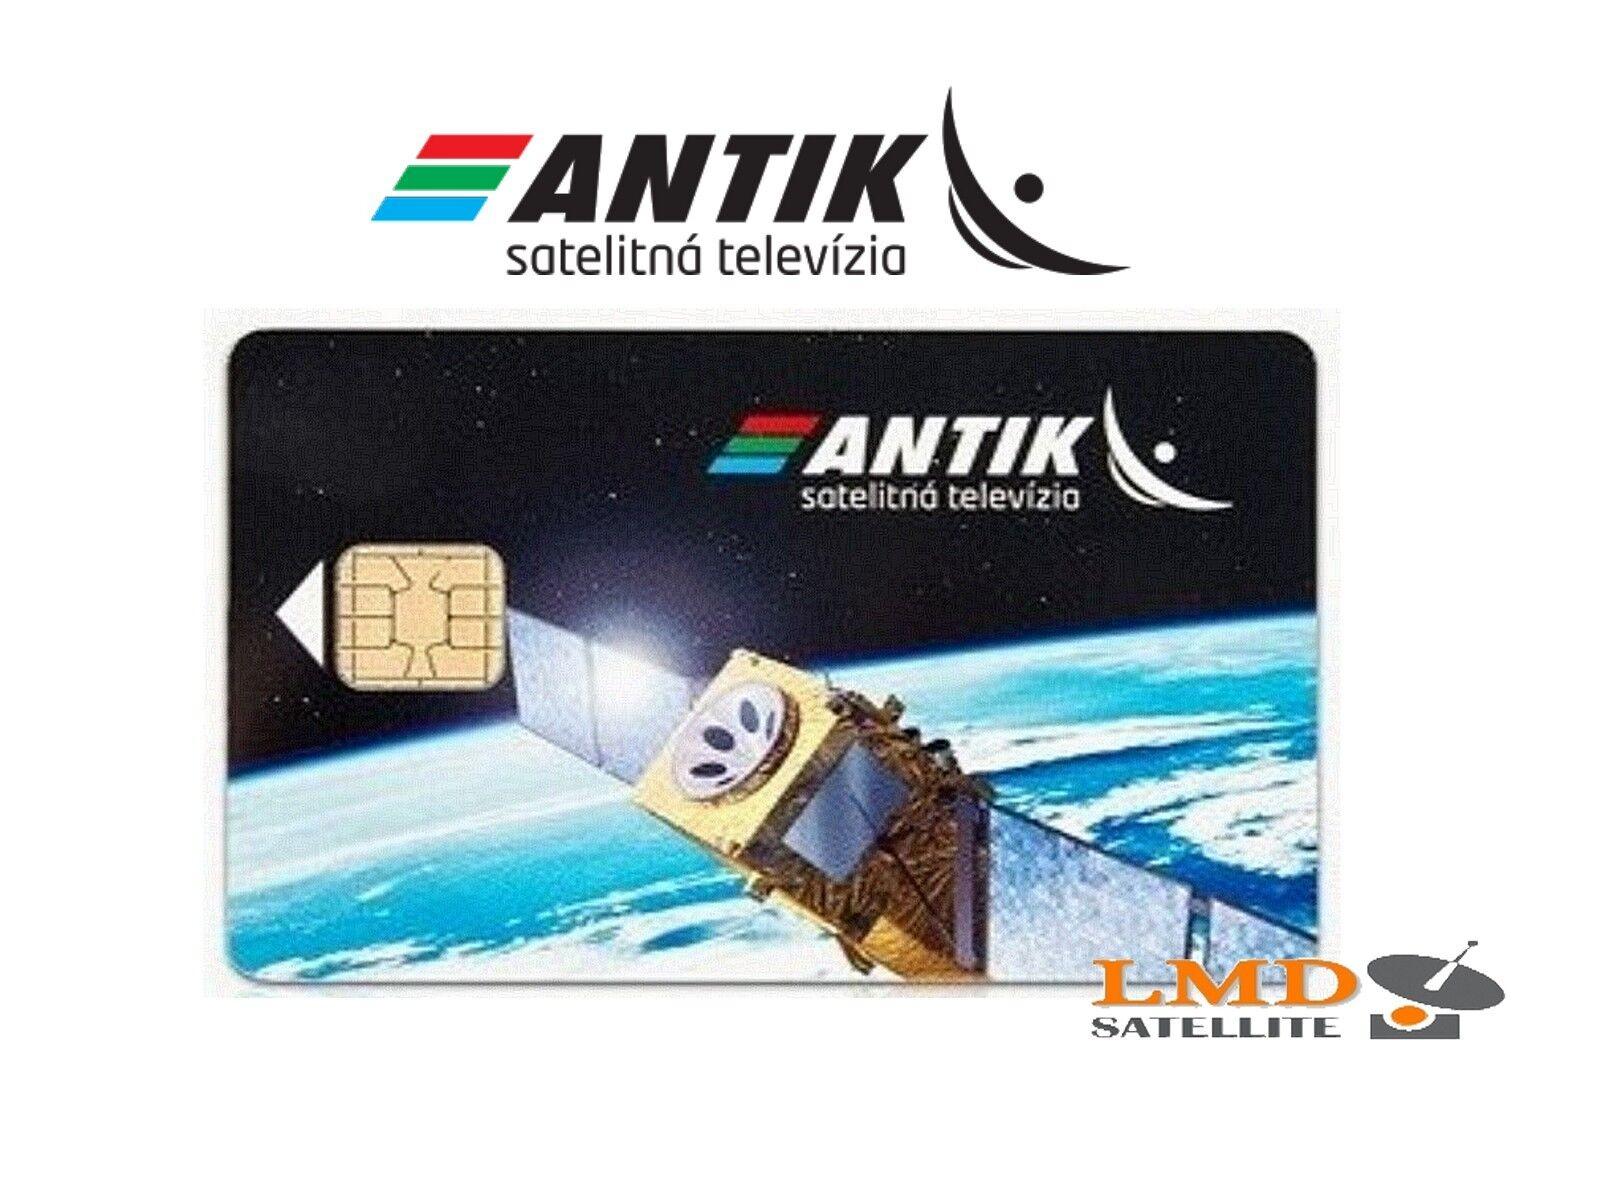 Antiksat Satellite Subscription Card Slovak And Czech Tv Channels On